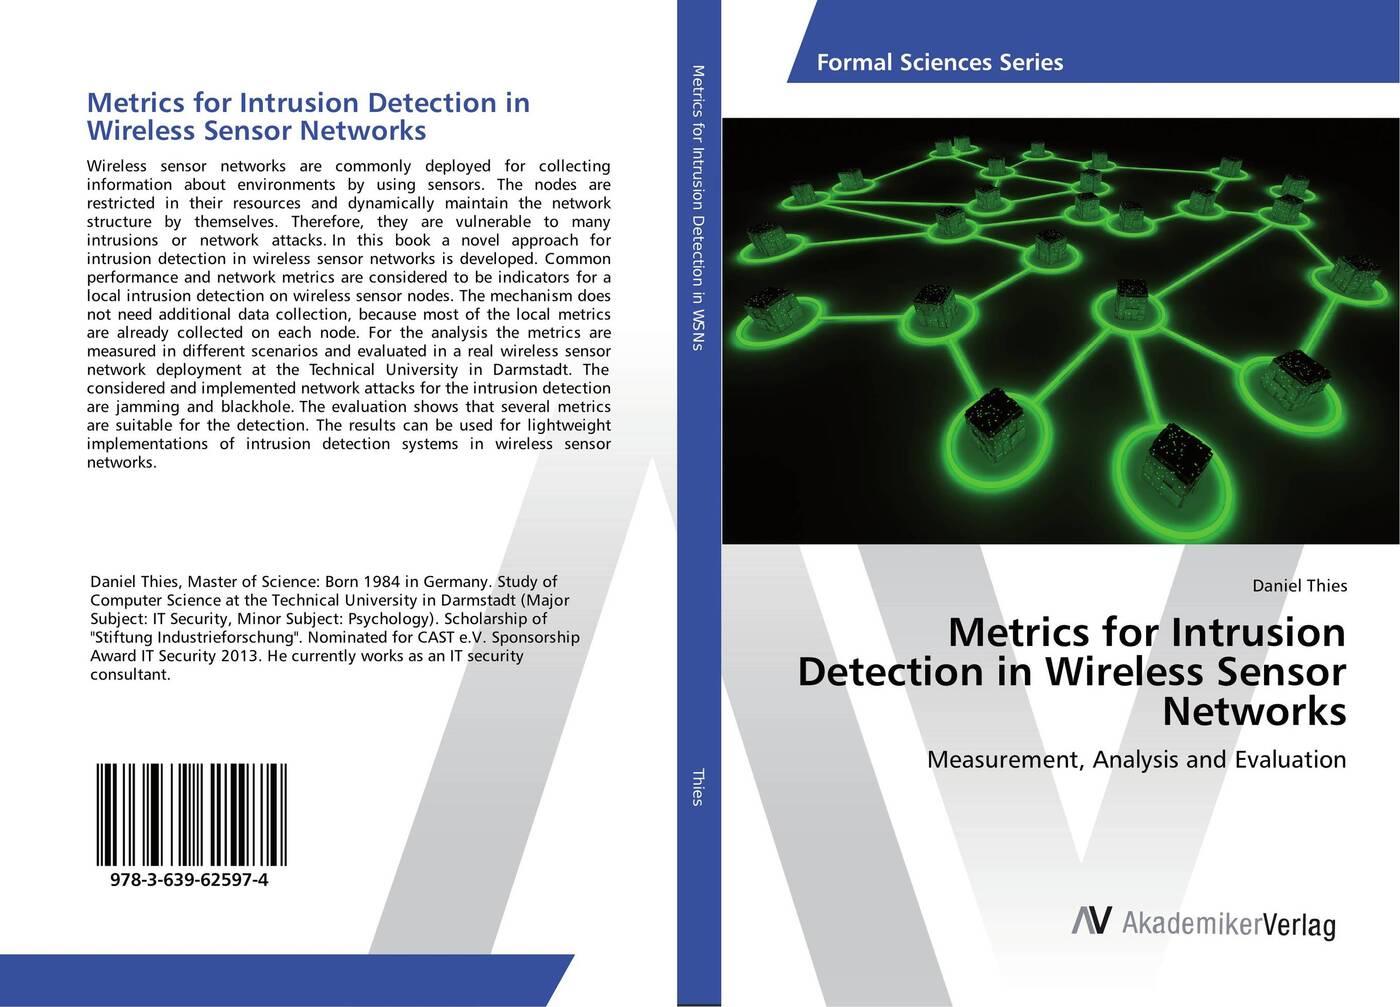 Daniel Thies Metrics for Intrusion Detection in Wireless Sensor Networks localization in wireless sensor network